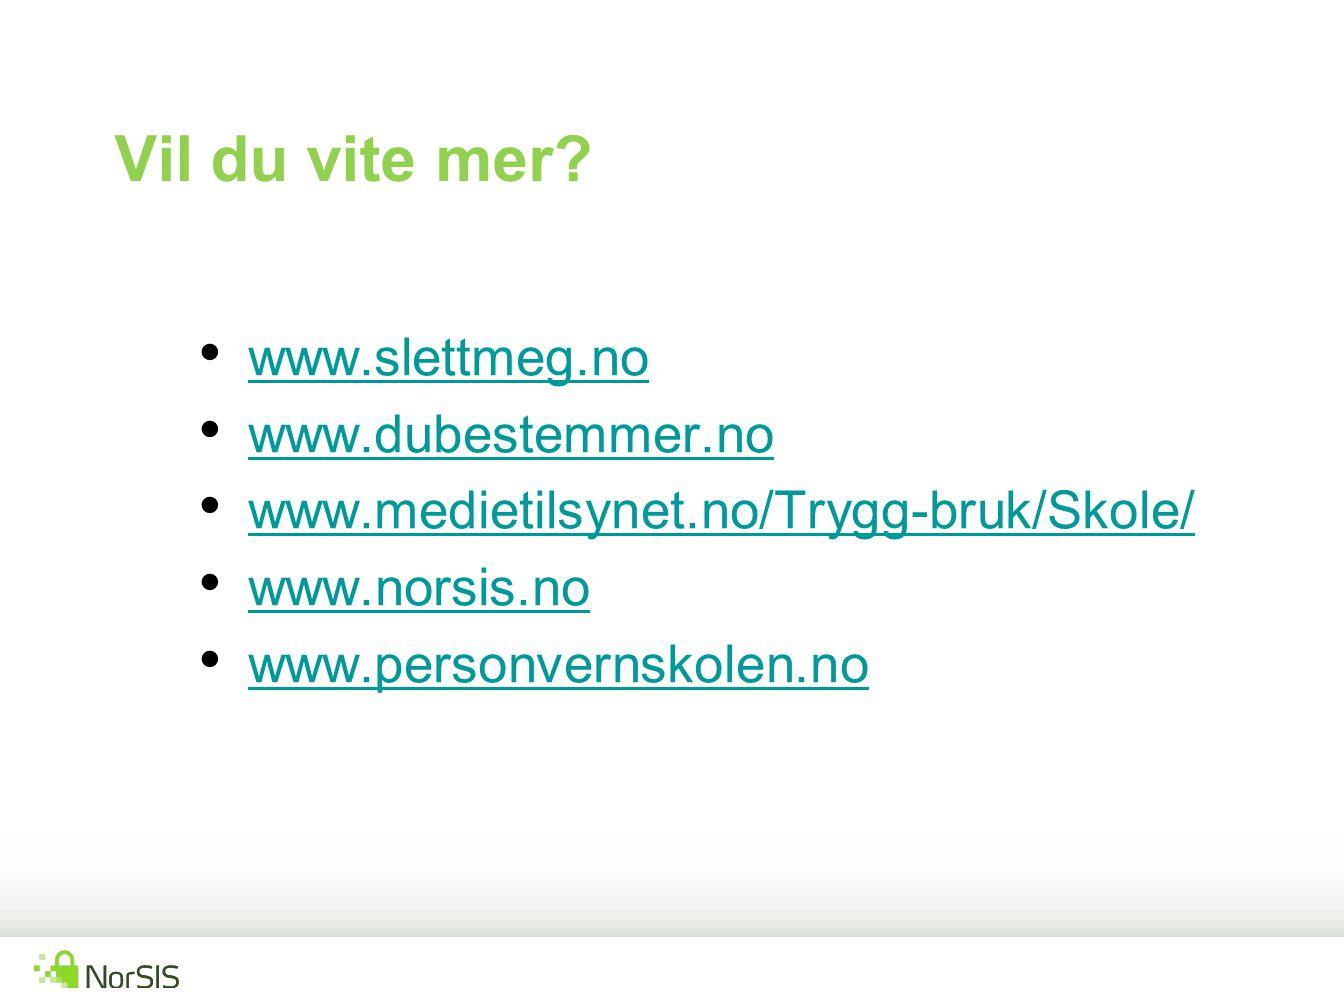 www.slettmeg.no www.dubestemmer.no www.medietilsynet.no/Trygg-bruk/Skole/ www.norsis.no www.personvernskolen.no Vil du vite mer?